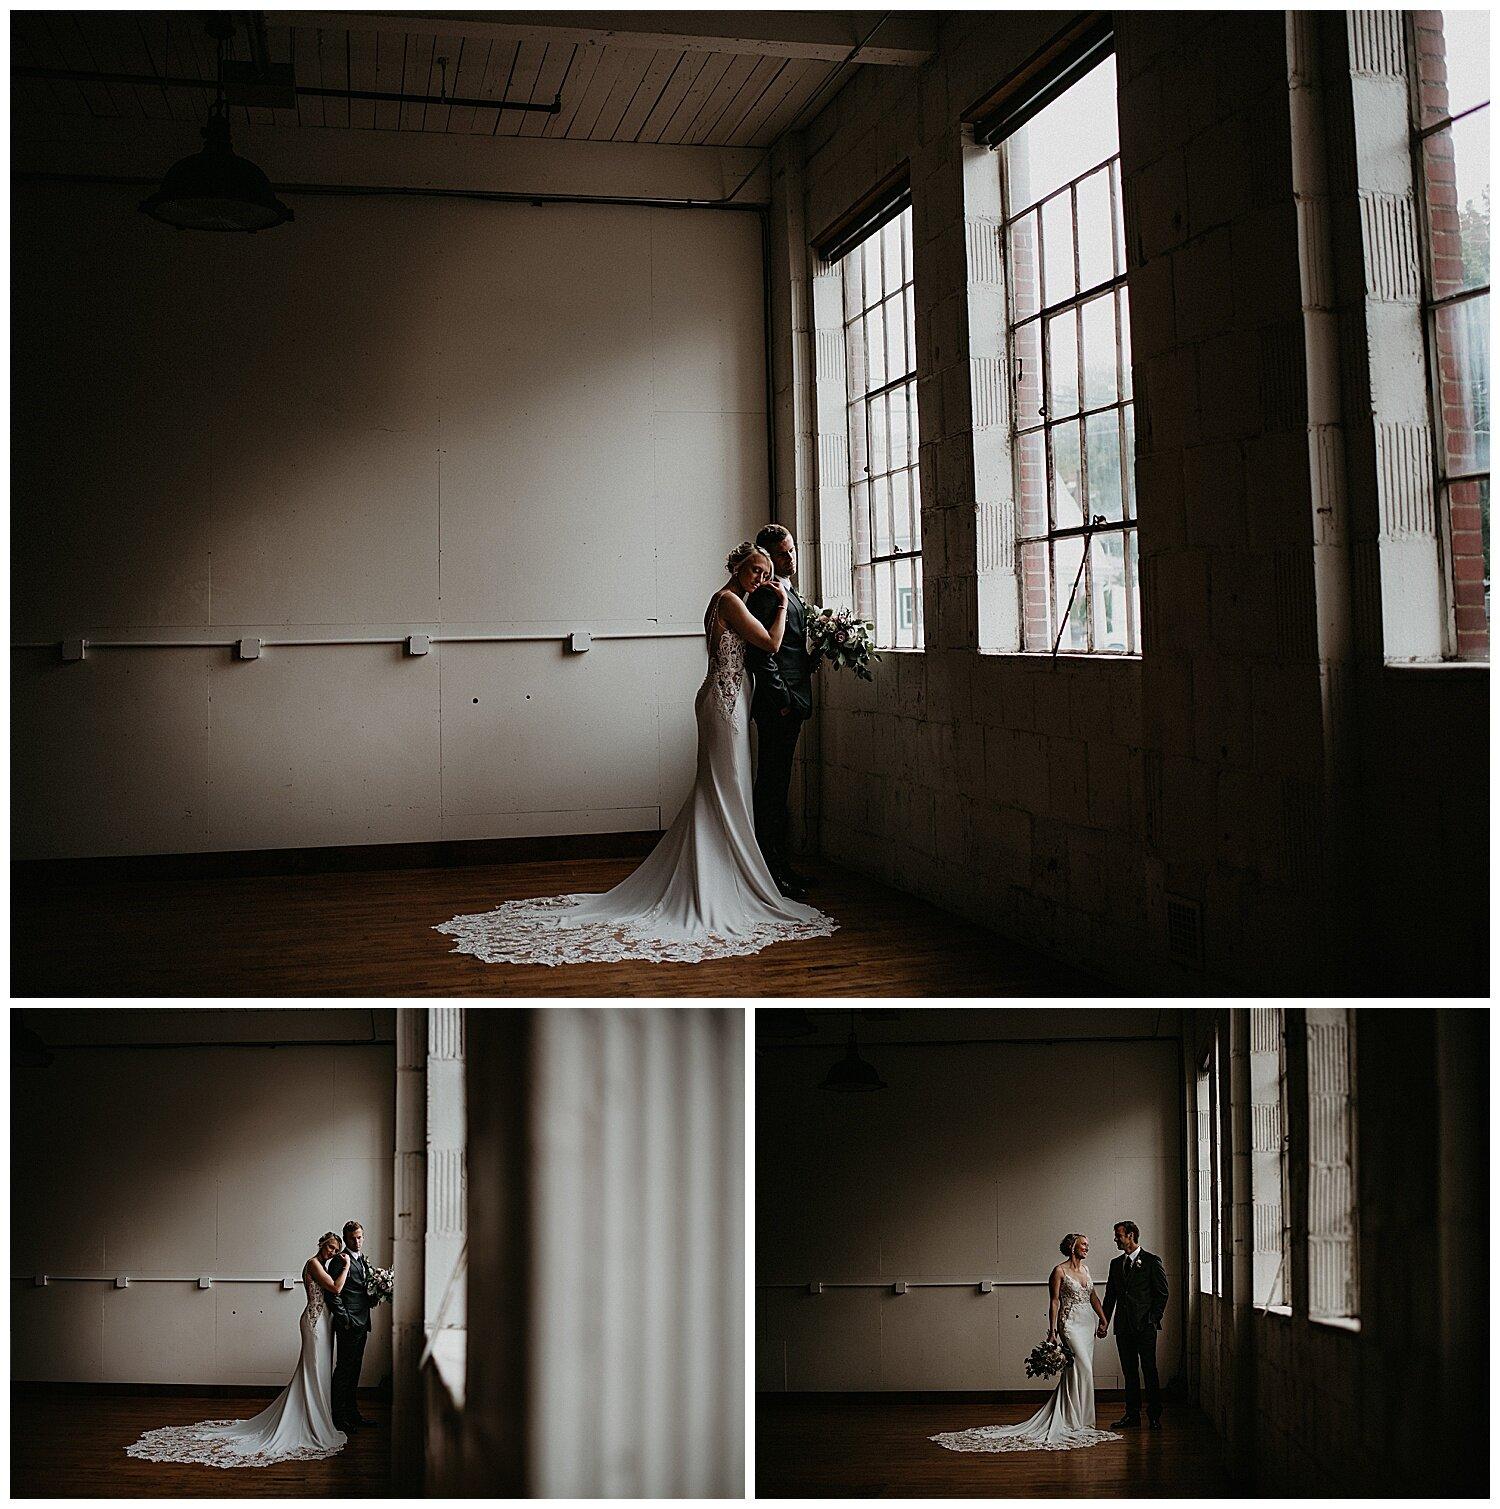 NEPA-Lewisburg-Wedding-Photographer-at-the-Rusty-Rail_0038.jpg